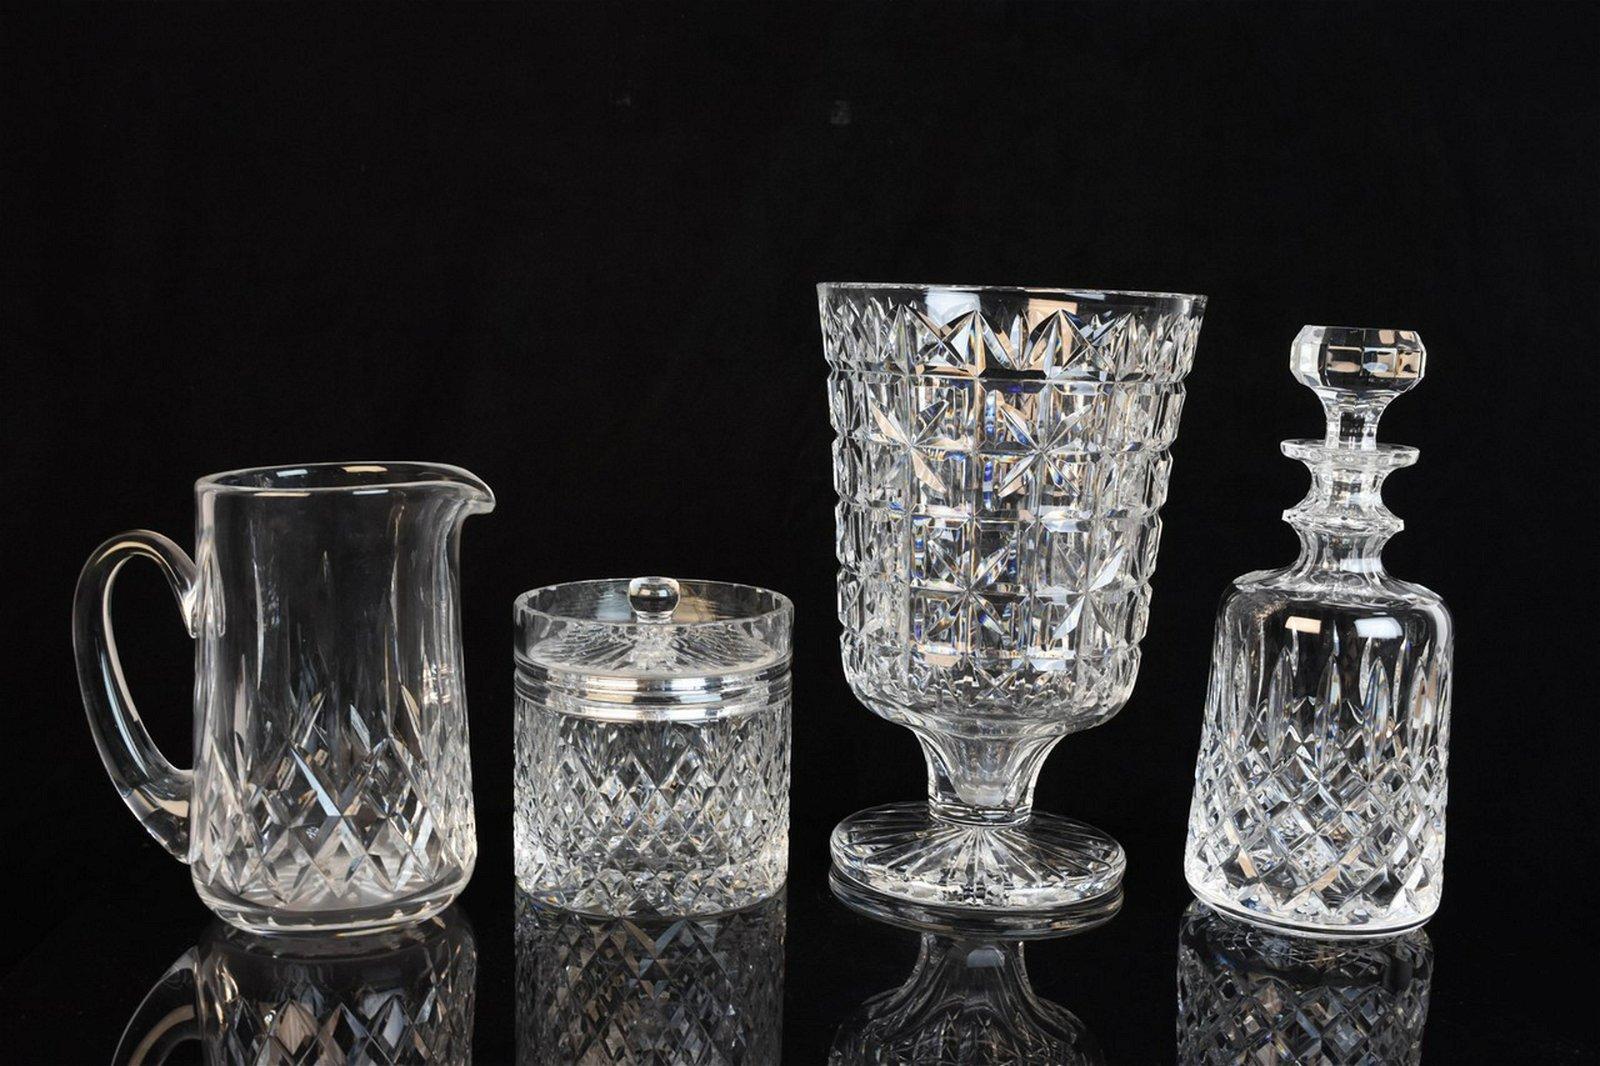 Waterford & Royal Brierley Crystal